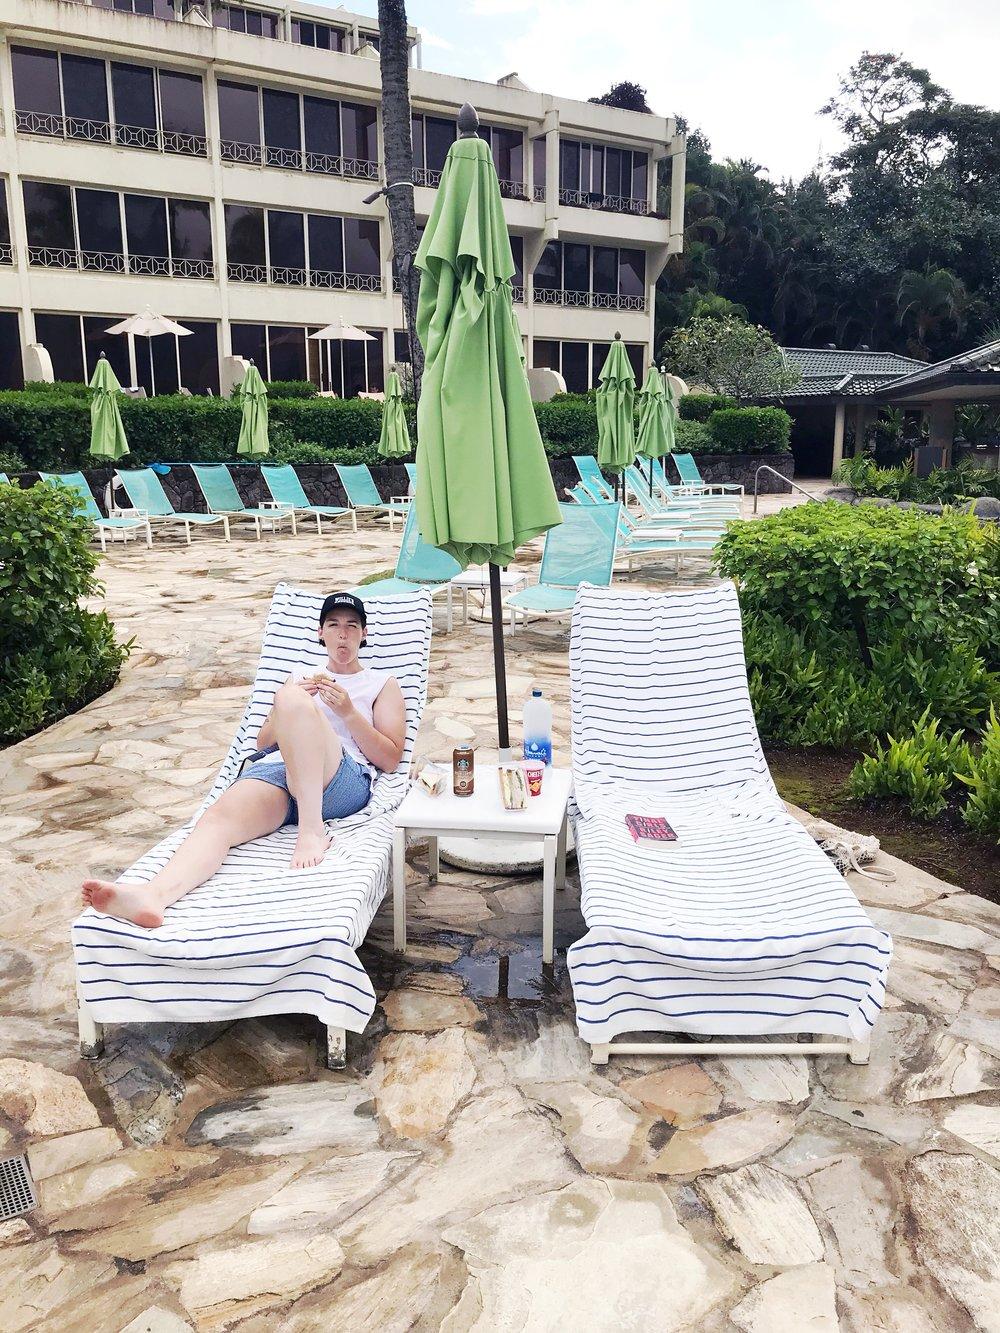 Pool_Chairs_St_Regis